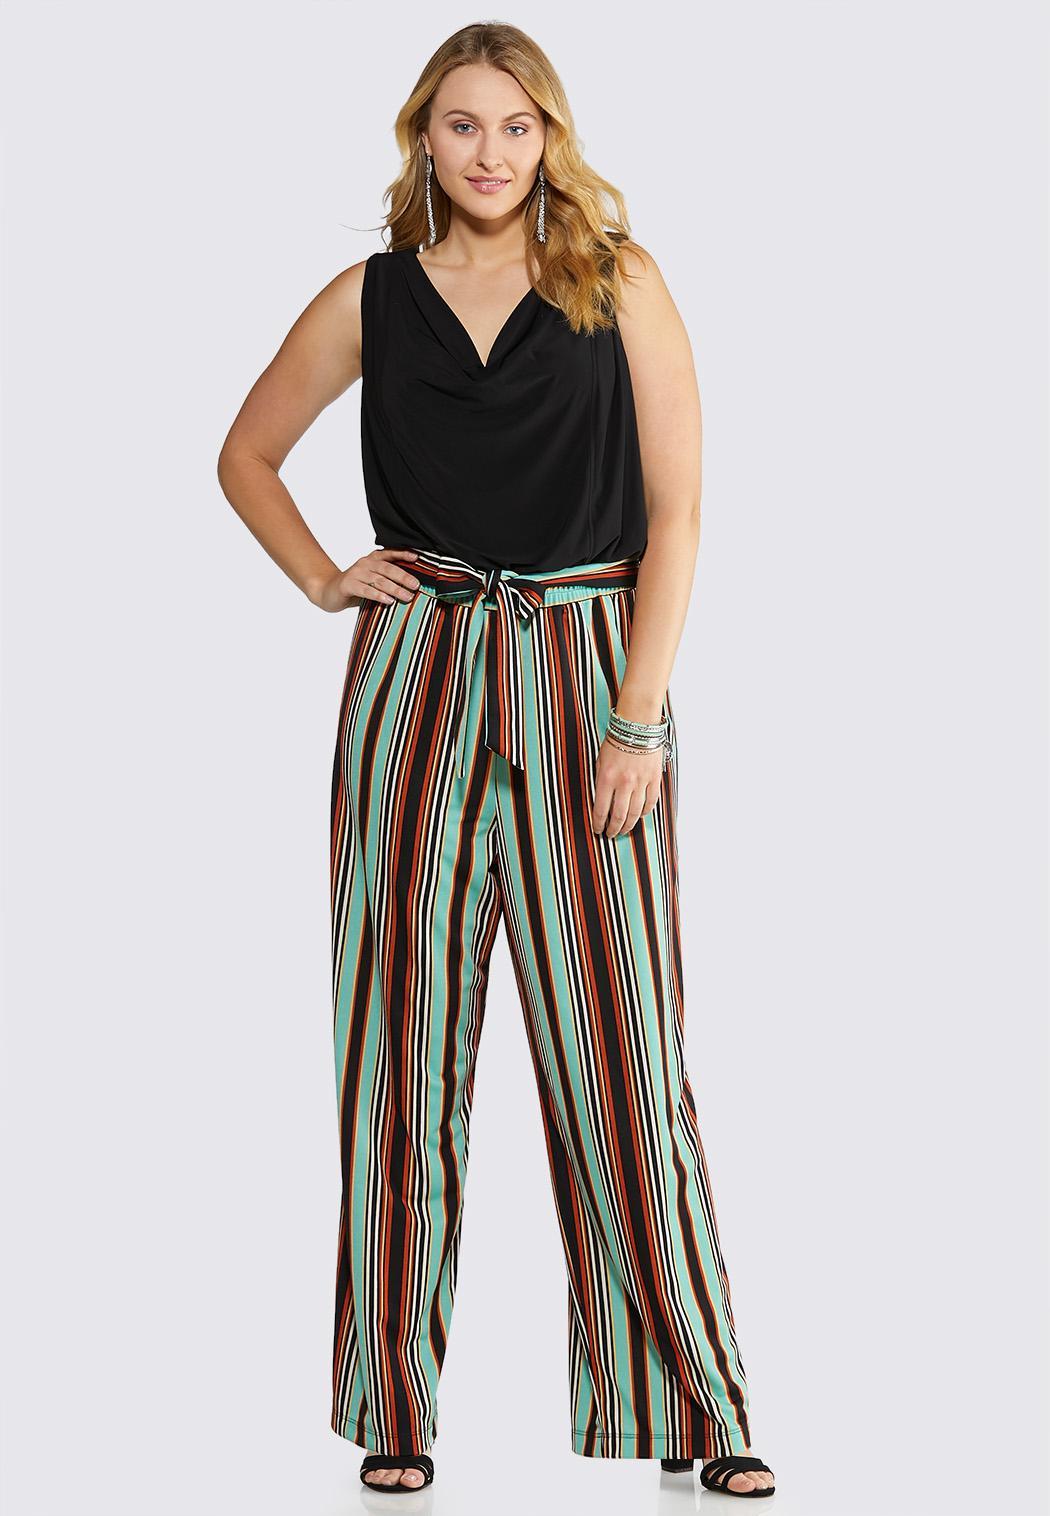 Plus Size Solids And Stripes Jumpsuit